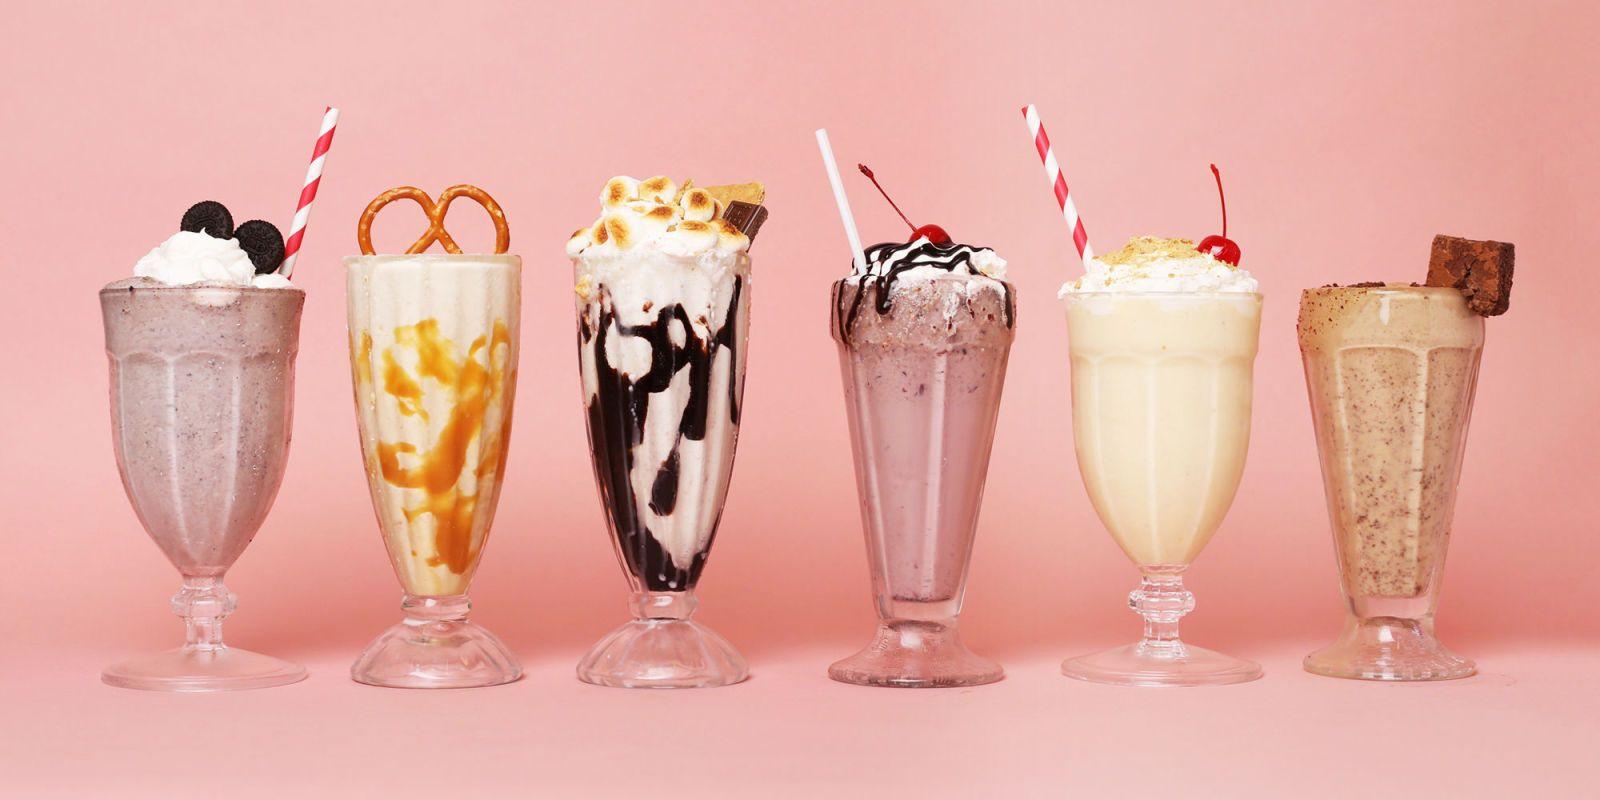 Old fashioned milkshake recipes 81